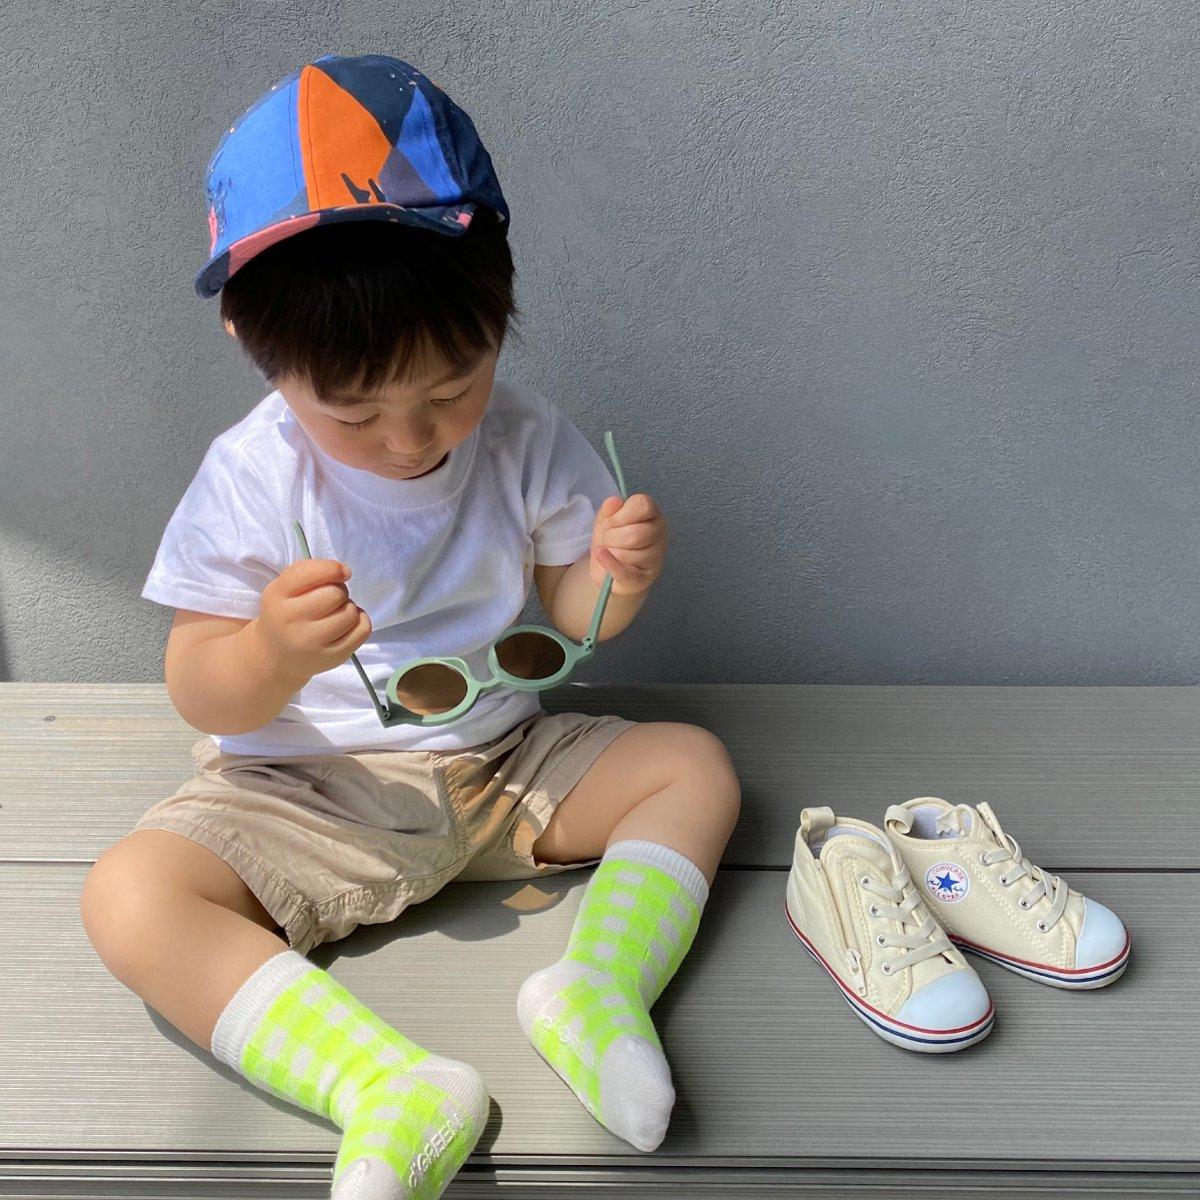 【BABY】Neon Check Socks 詳細画像19